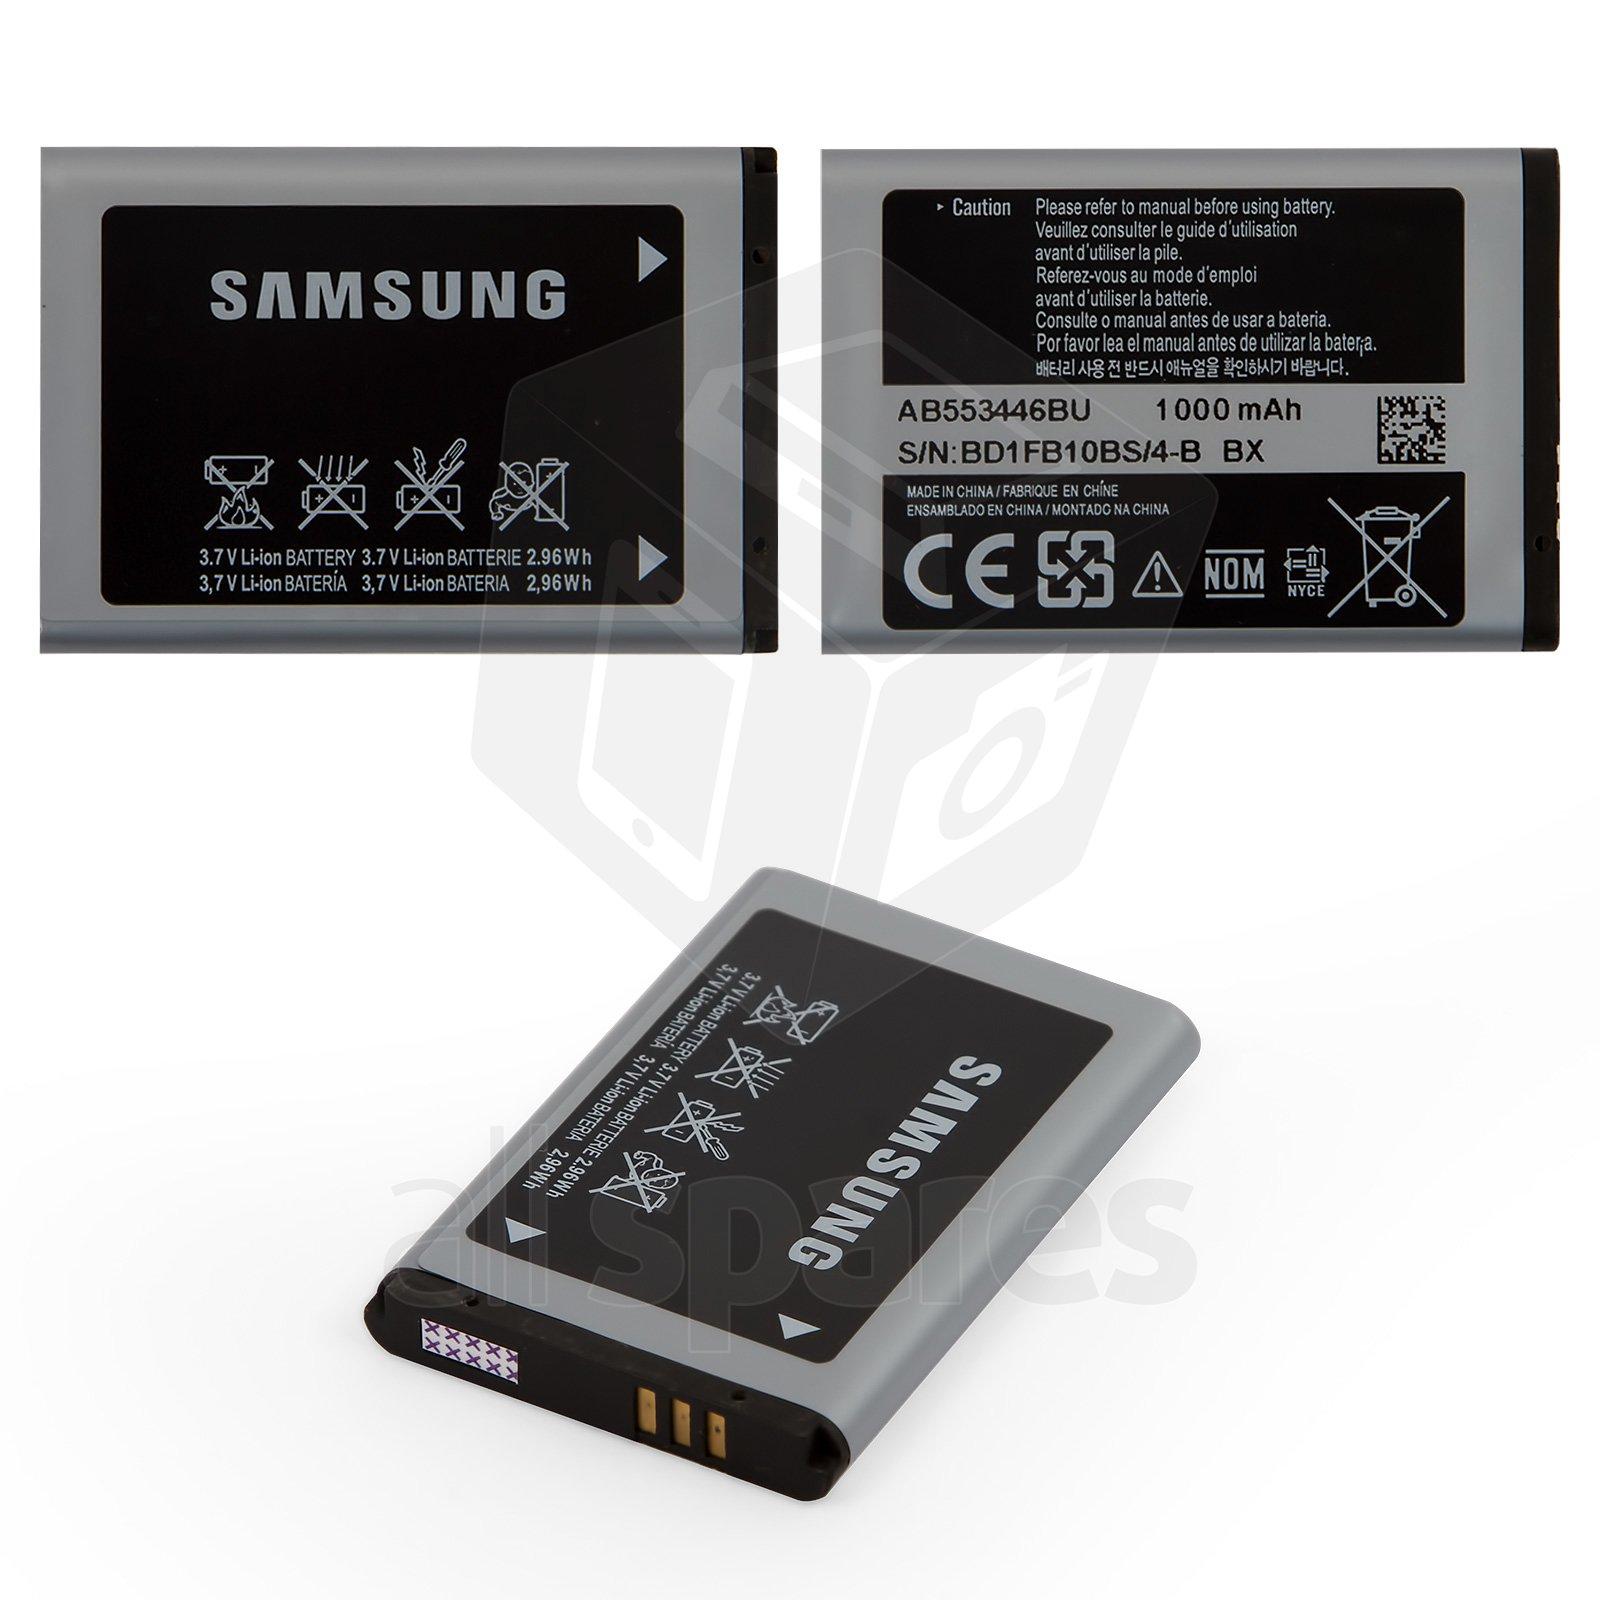 battery ab553446bu for samsung b100 b2100 c3212 c3300 c5130 rh all spares com Verizon Samsung Flip Phone Manual Samsung Galaxy S Manual